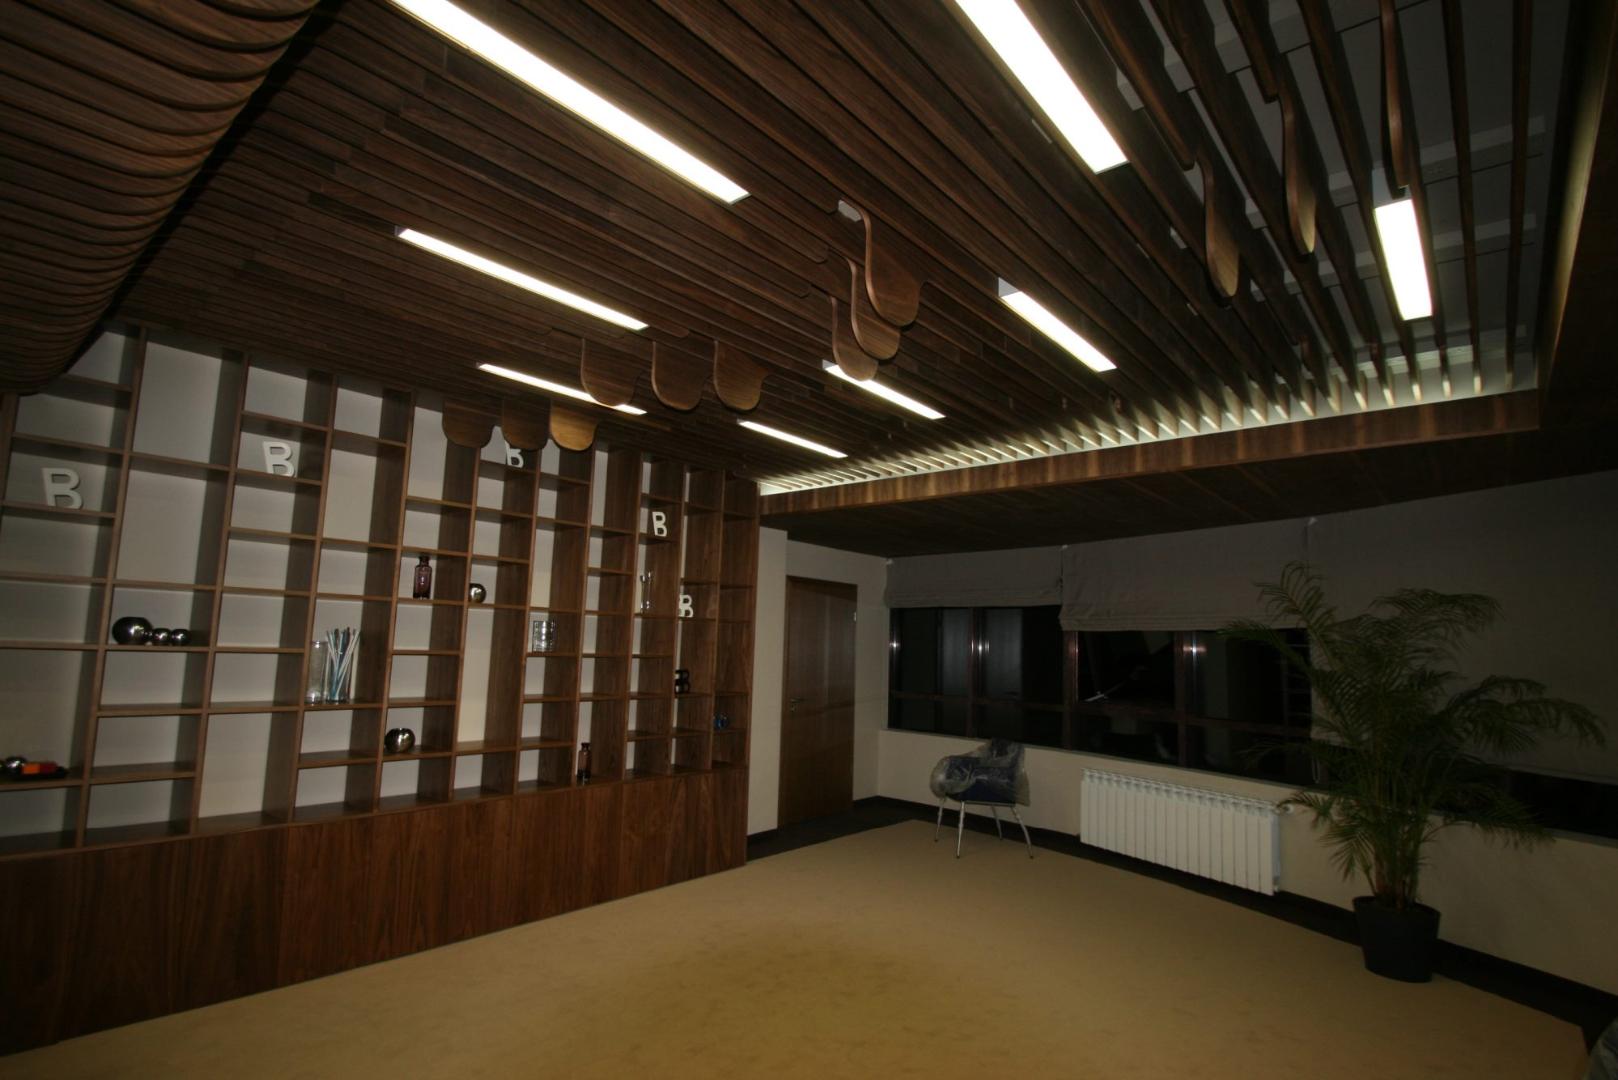 placari pereti corian iluminat led receptie corian termoformat furnir tavan furnir nuc tridimensional mobilier trafoare atipic depa009